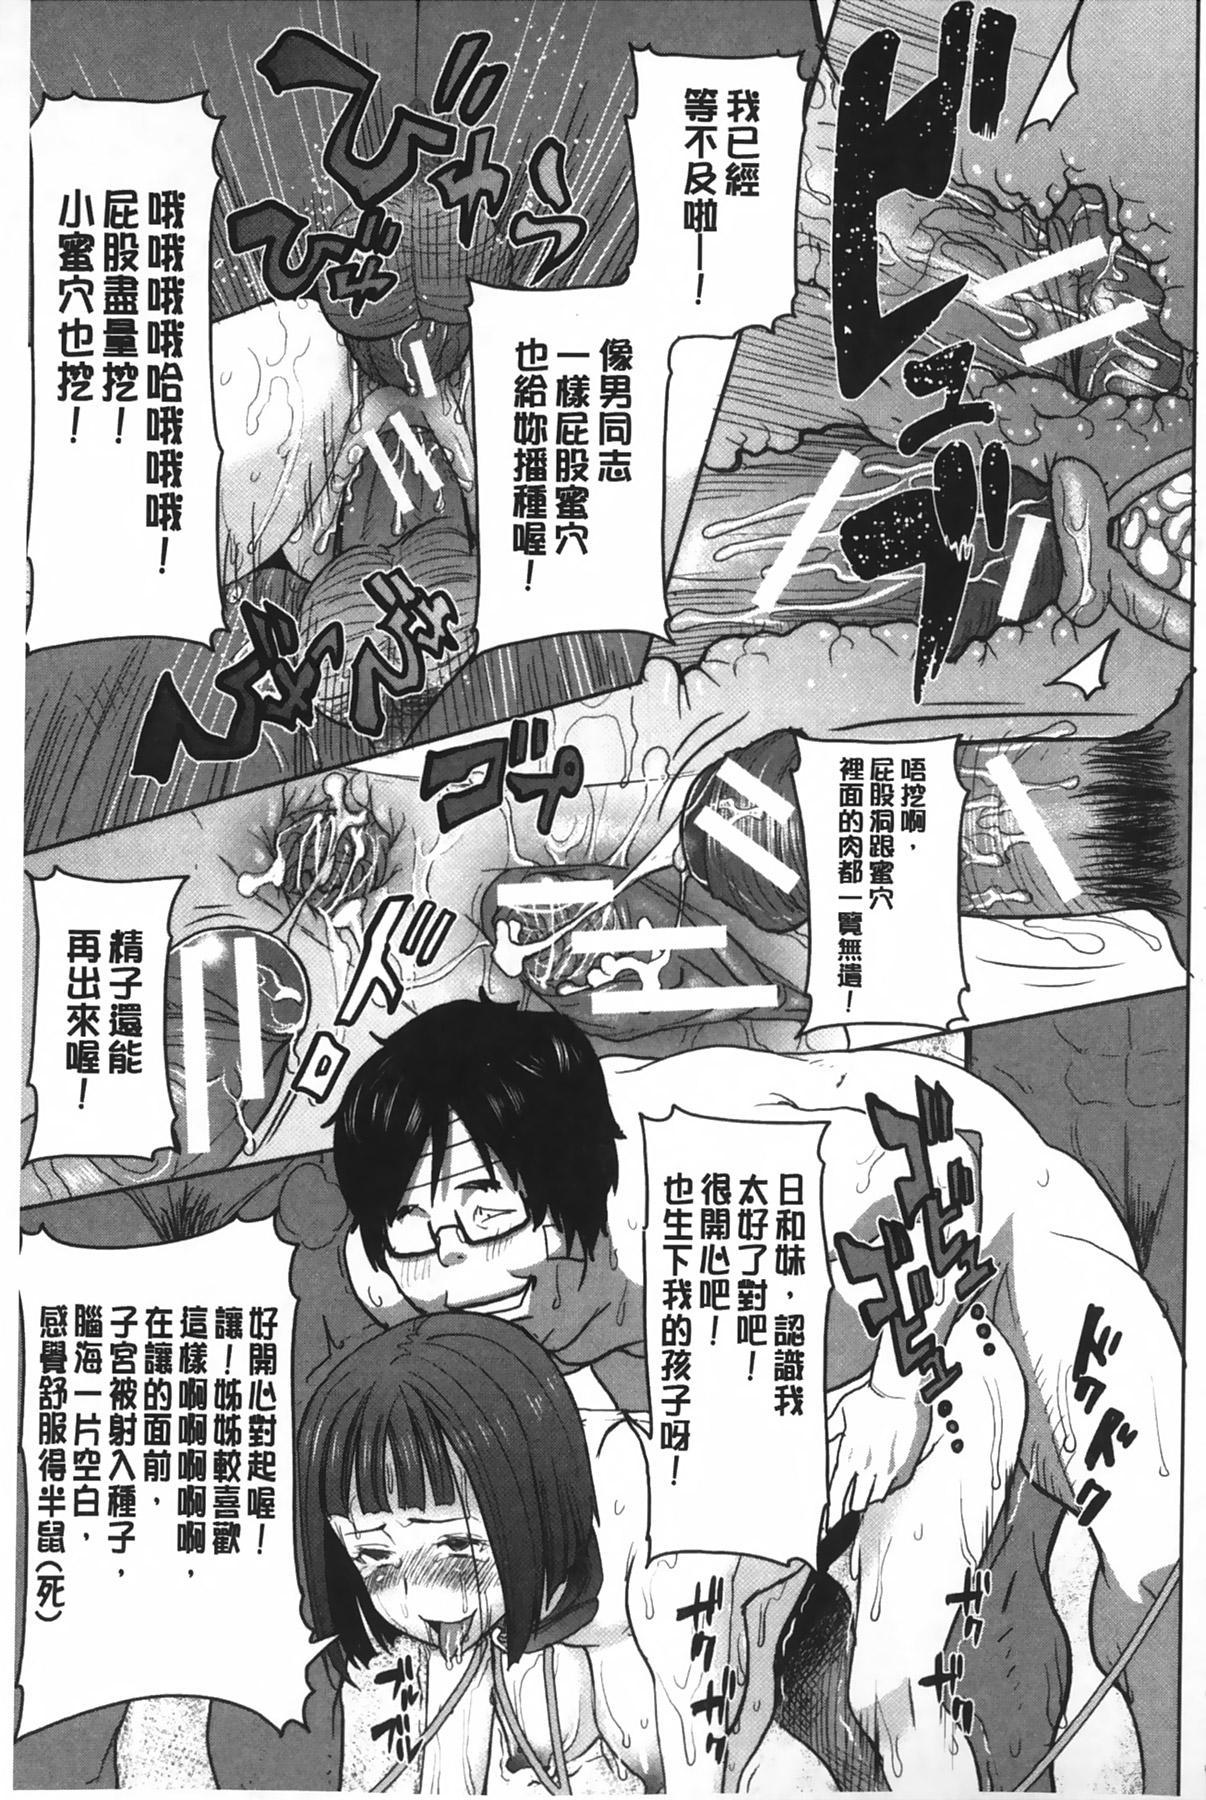 Ane Unsweet - Mihiragi Hiyori + | 姊姊不甜美 彌平木日和+ 131